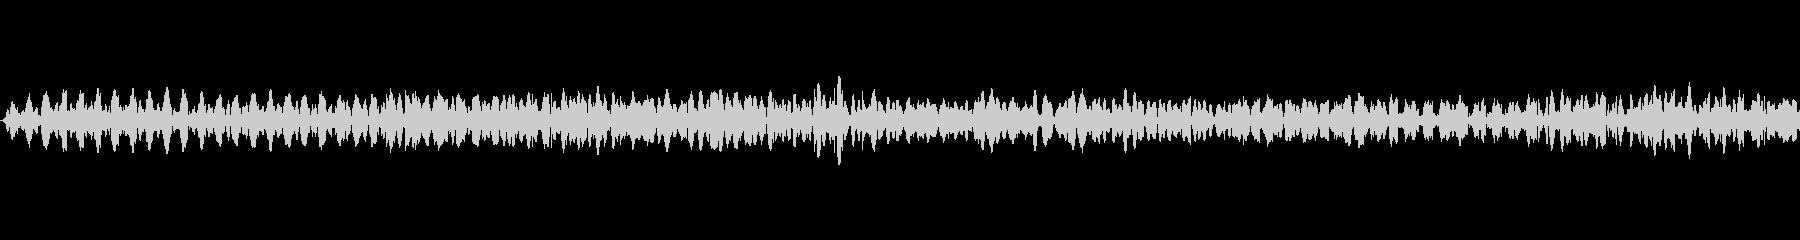 SciFi EC01_87_1の未再生の波形